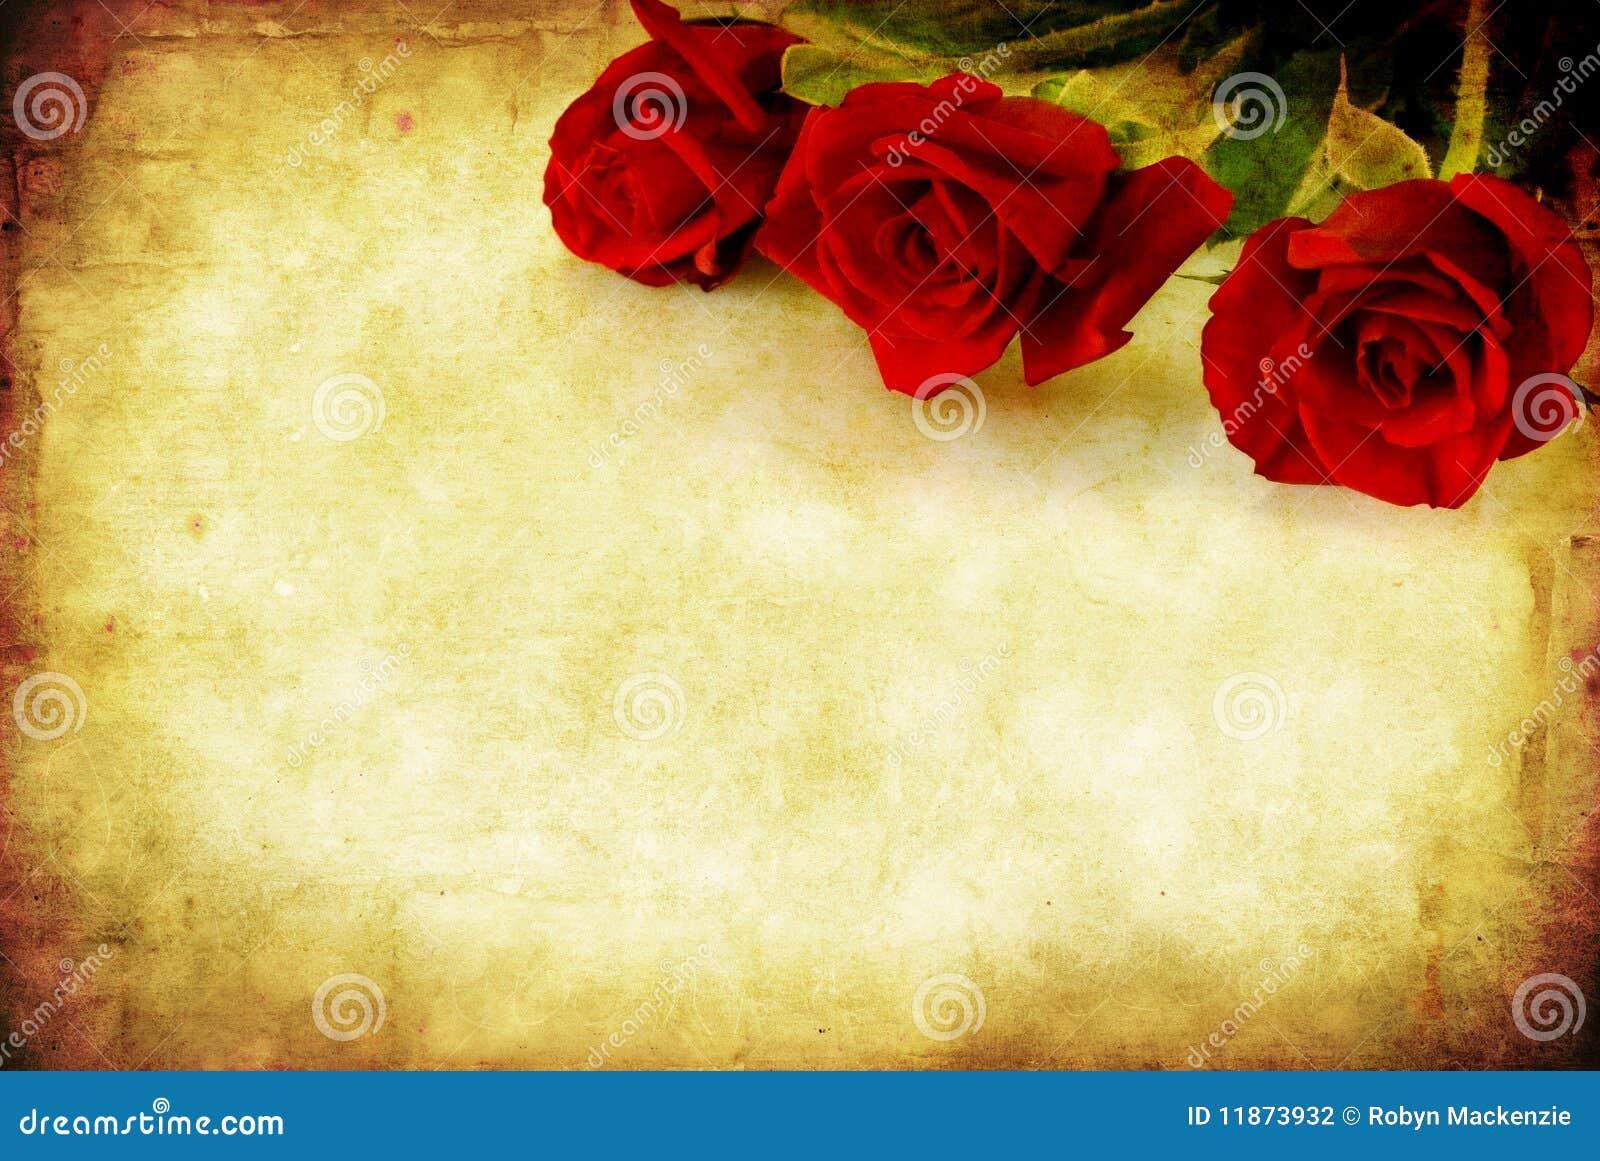 Grunge Red Roses